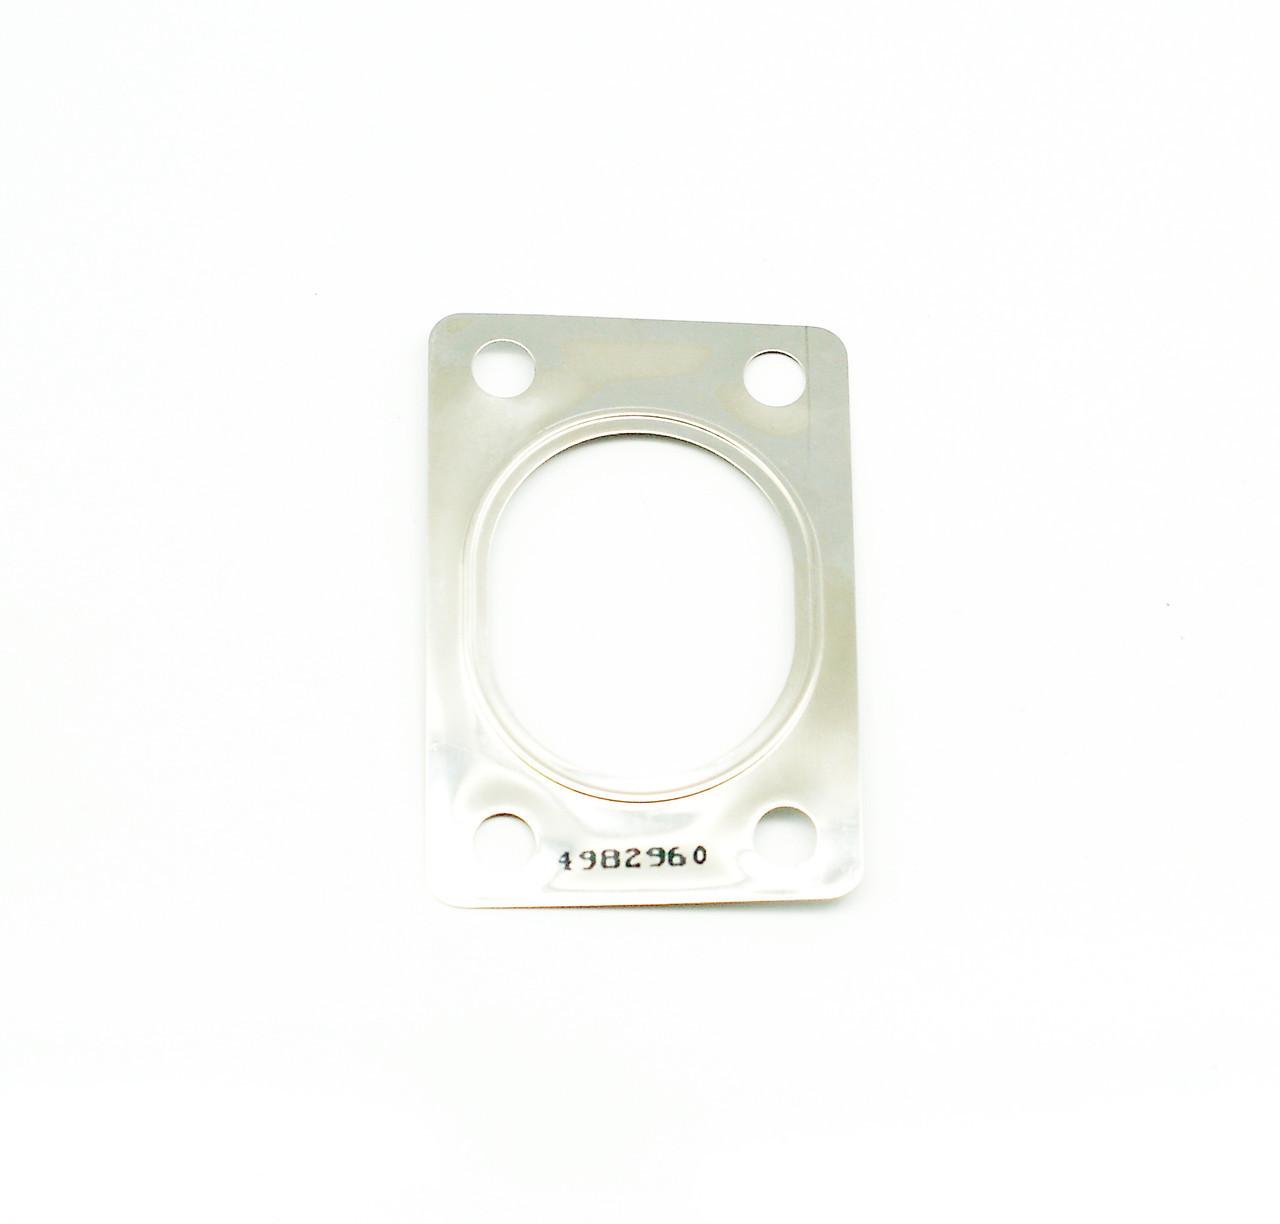 Прокладка турбокомпрессора Cummins 4982960 C6205115580